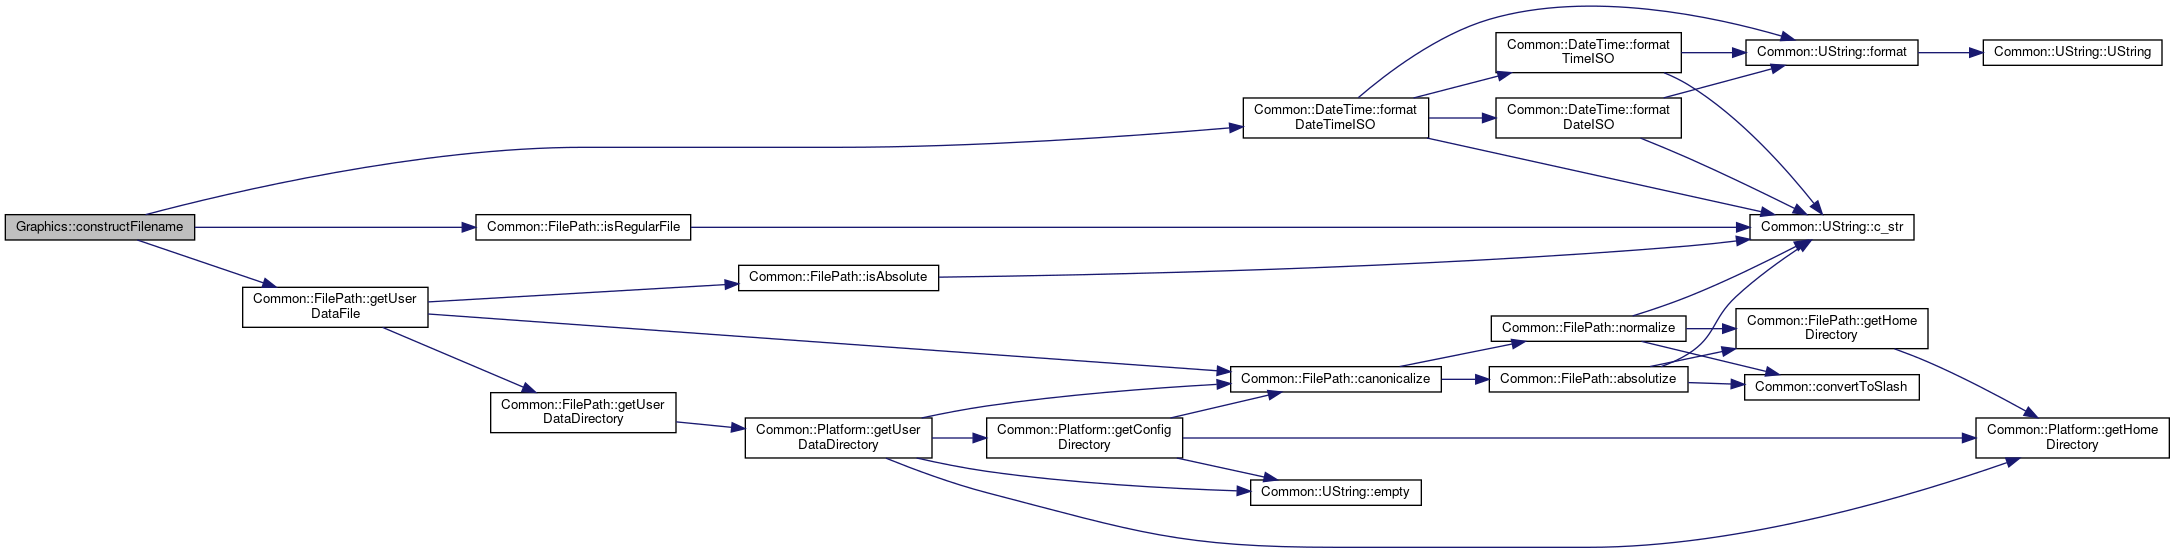 xoreos: Graphics Namespace Reference